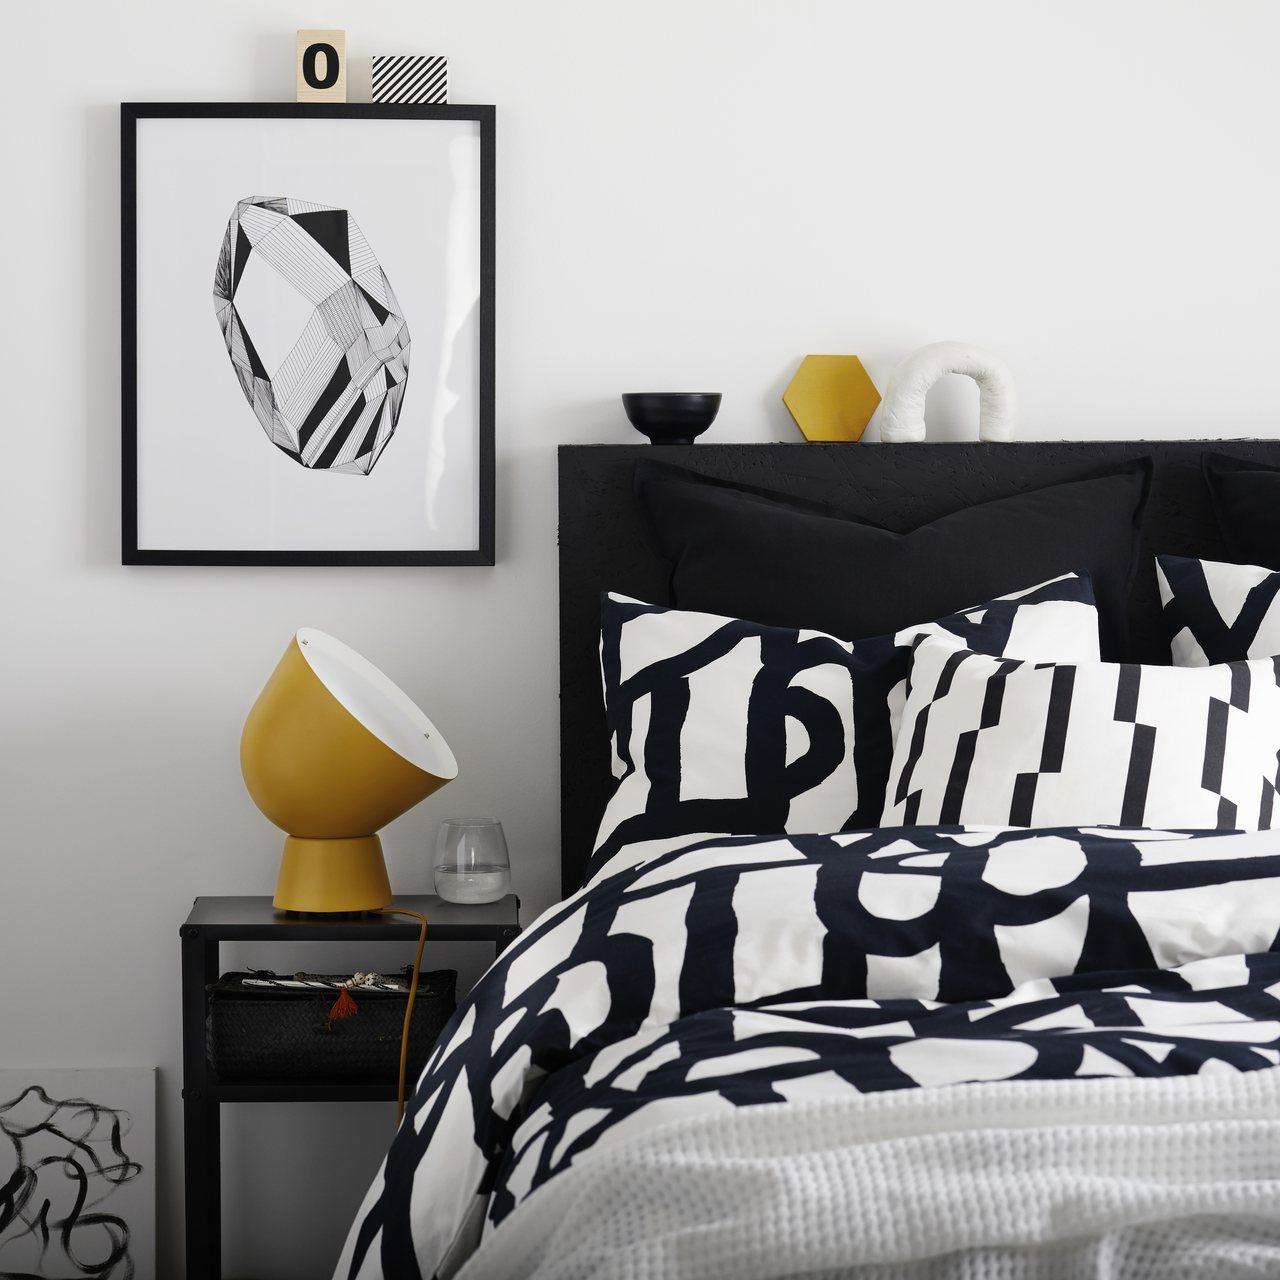 SKUGGBRÄCKA雙人被套組(黑白),售價1,099元,價格會因顏色、材質選...